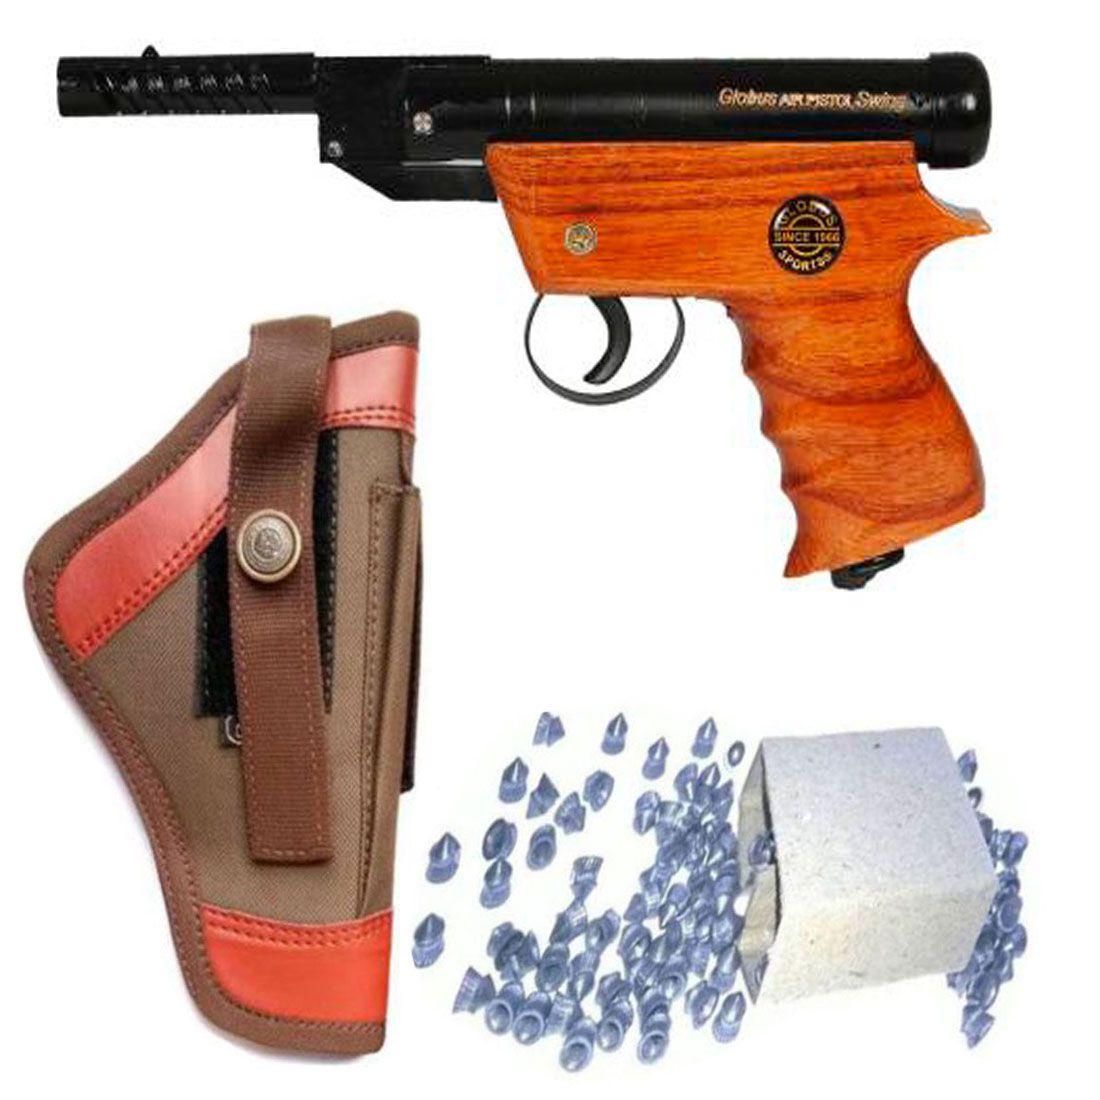 Peshkar Globus Swing Wooden Sports Air Gun With 100 Bullets & Cover